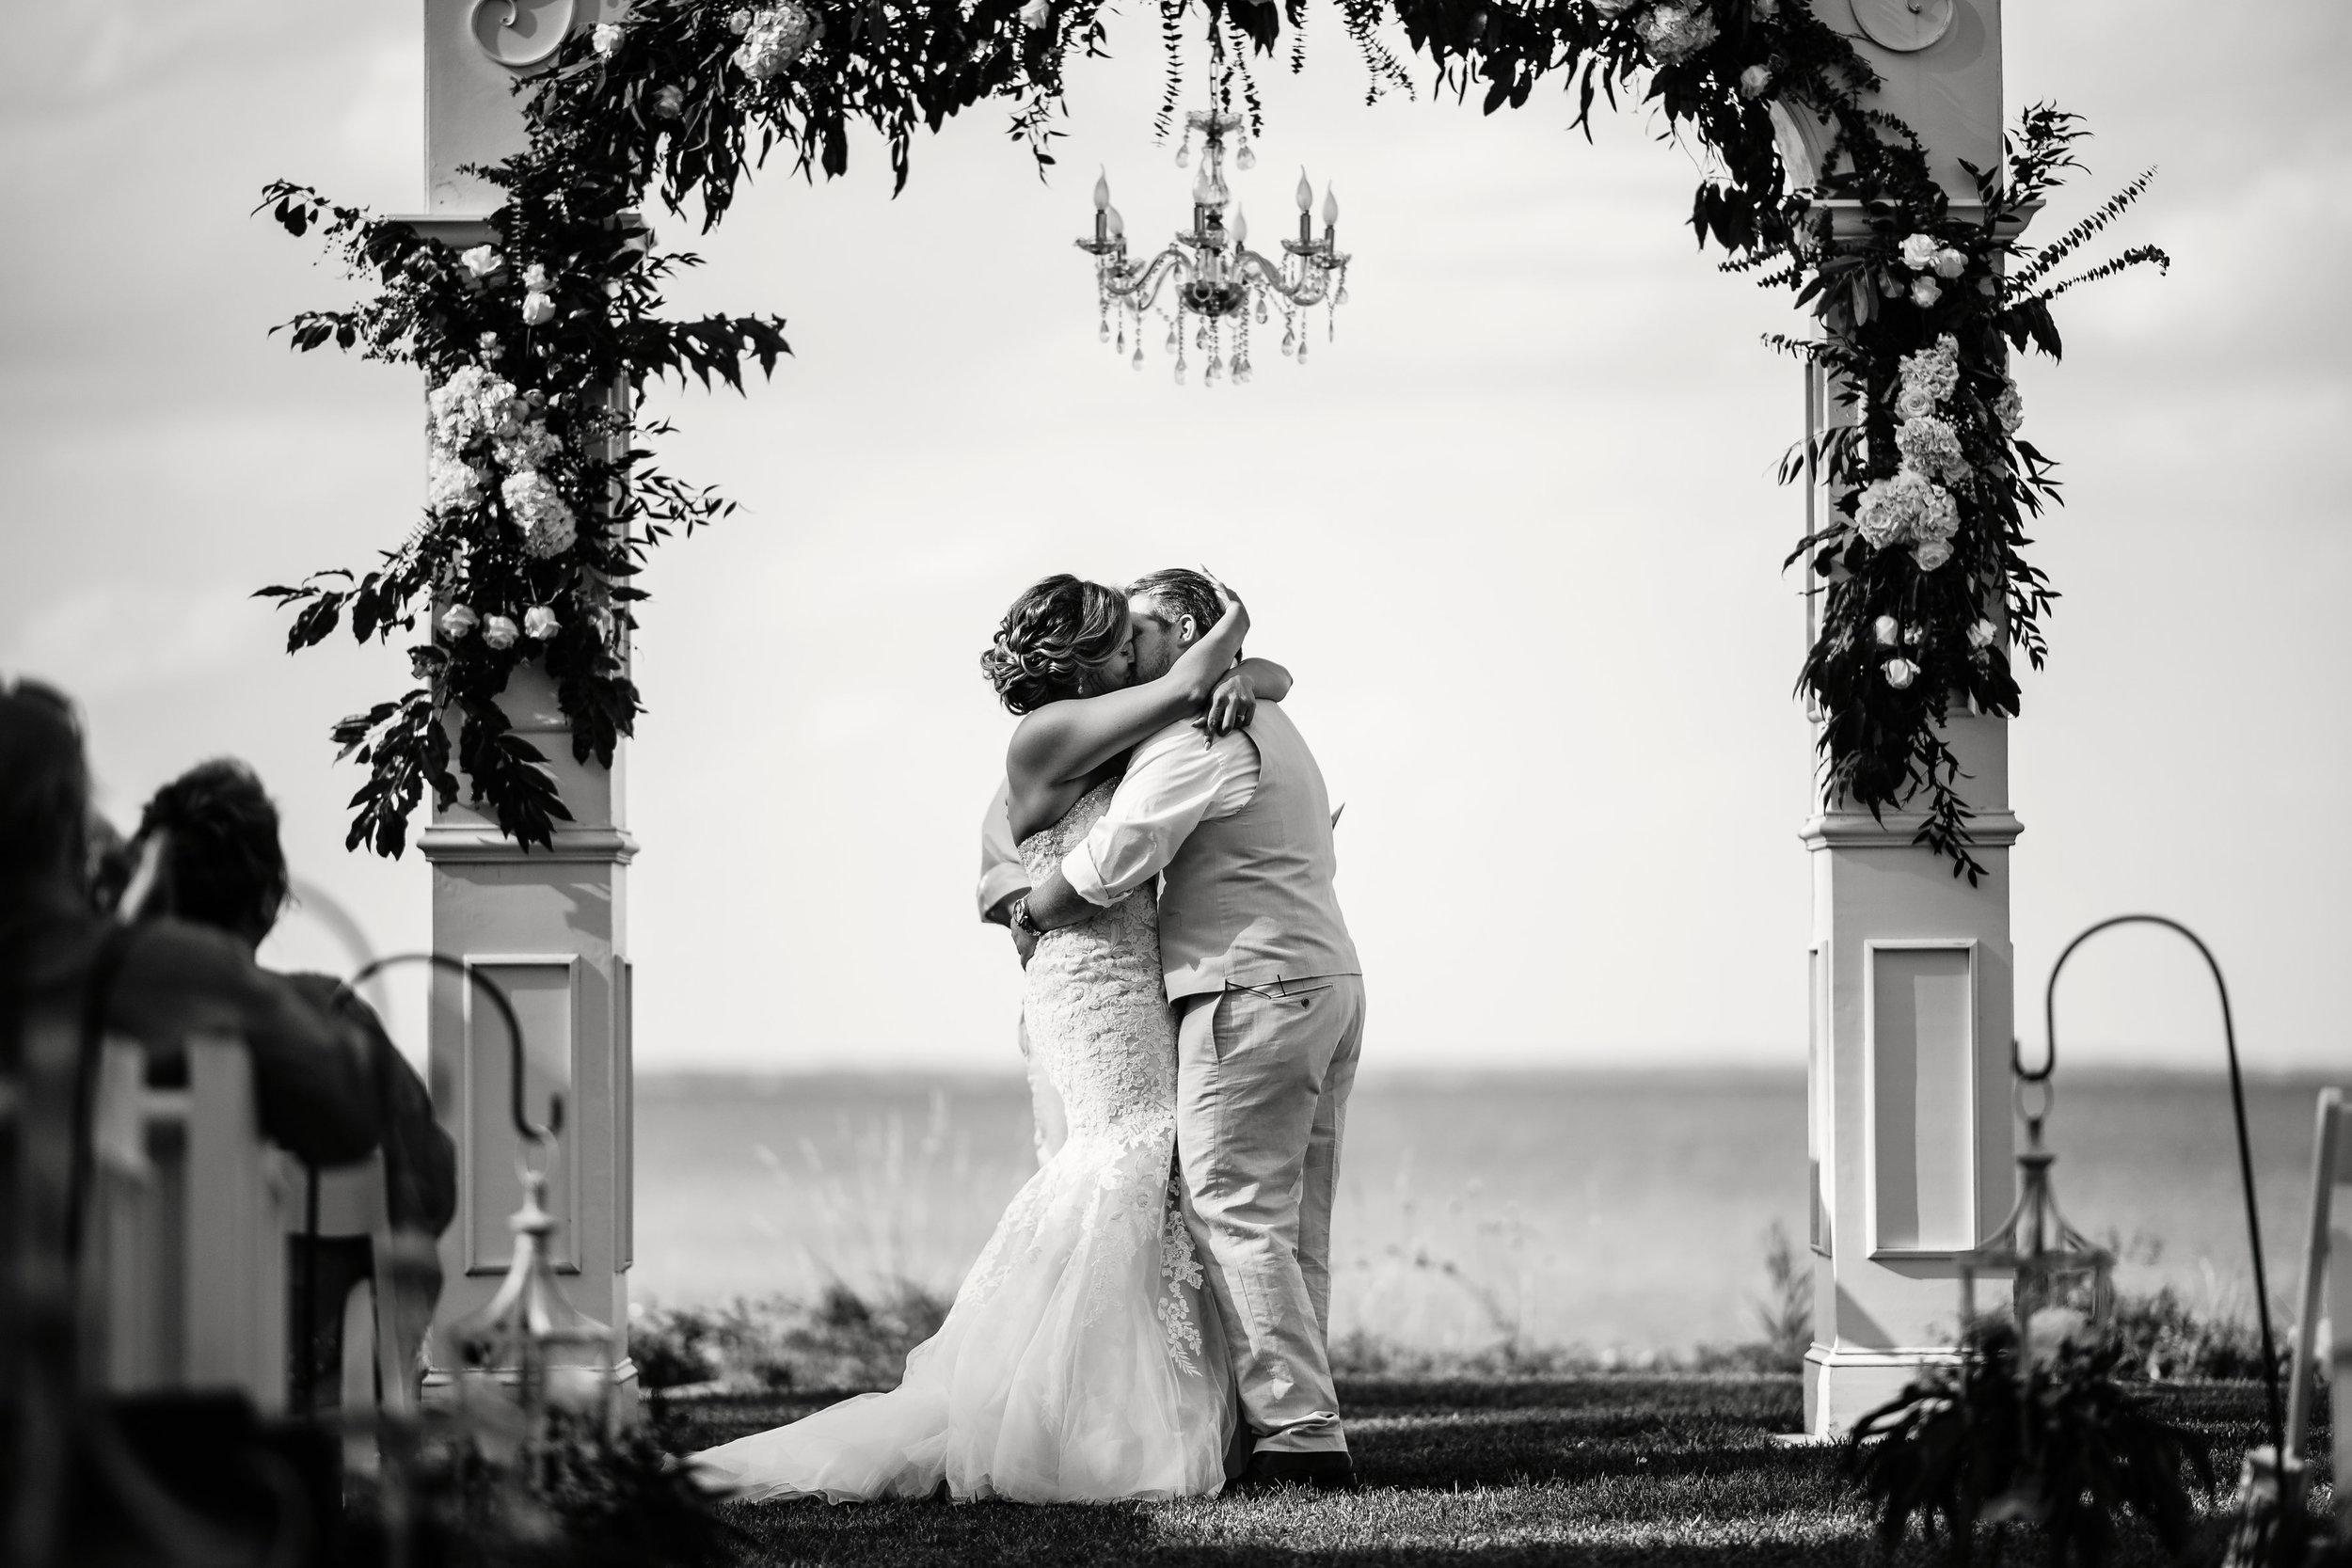 Erica&Jake_Wedding435.jpg